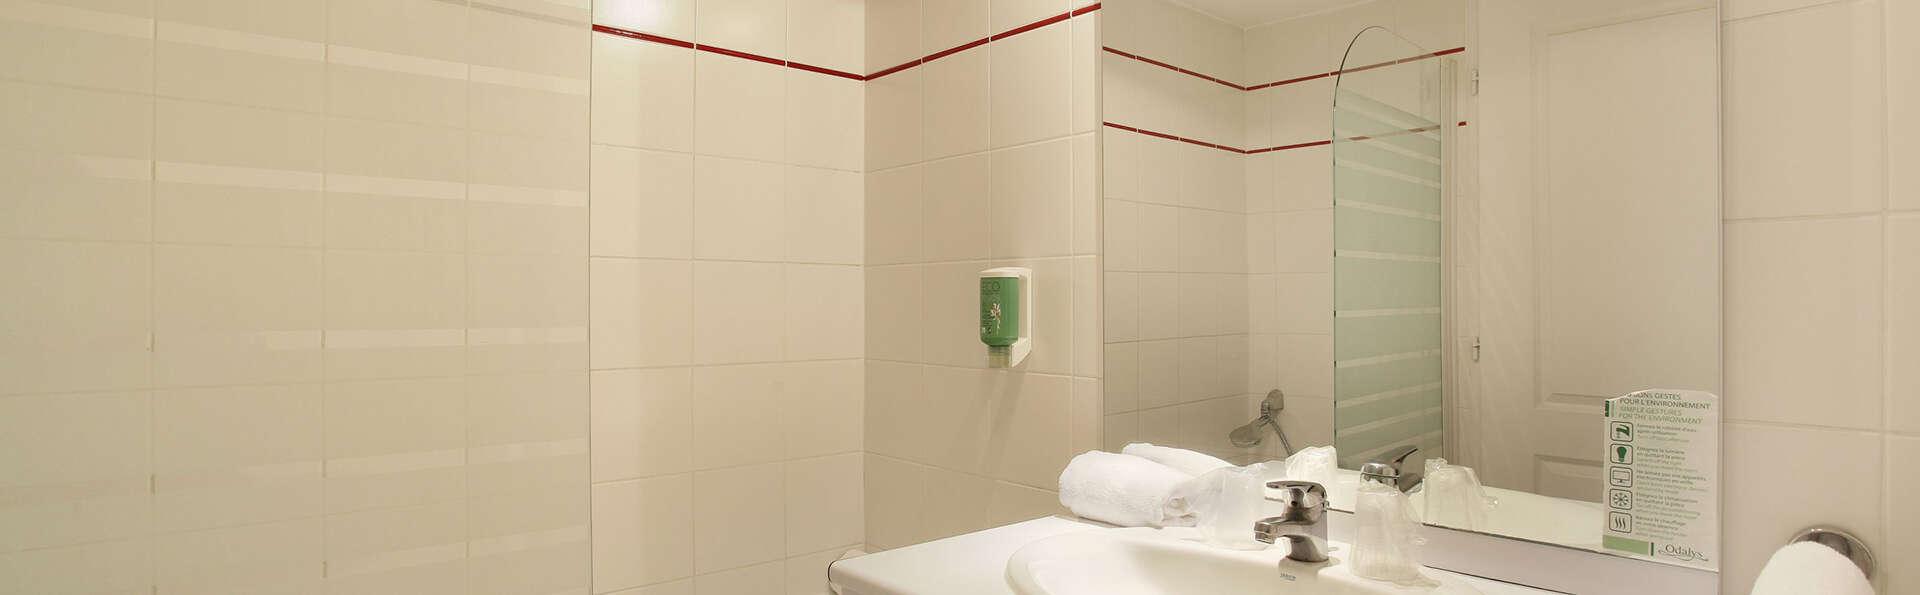 Appart'hôtel Odalys Aix Chartreuse - EDIT_NEW_Bathroom2.jpg